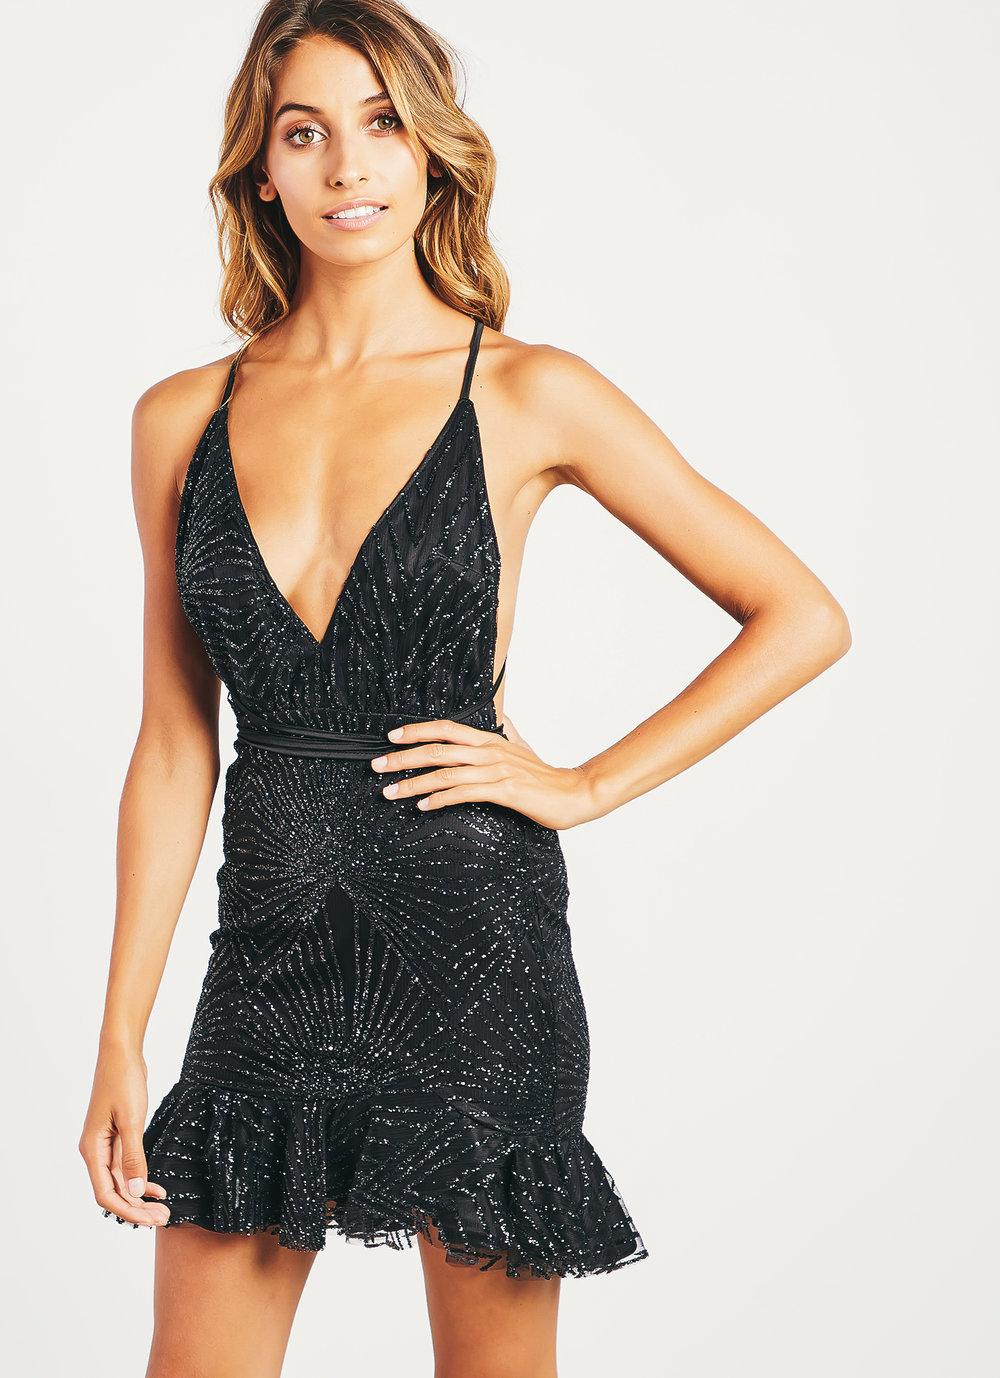 Get theGolden Globe Look - Shop Black Dresses